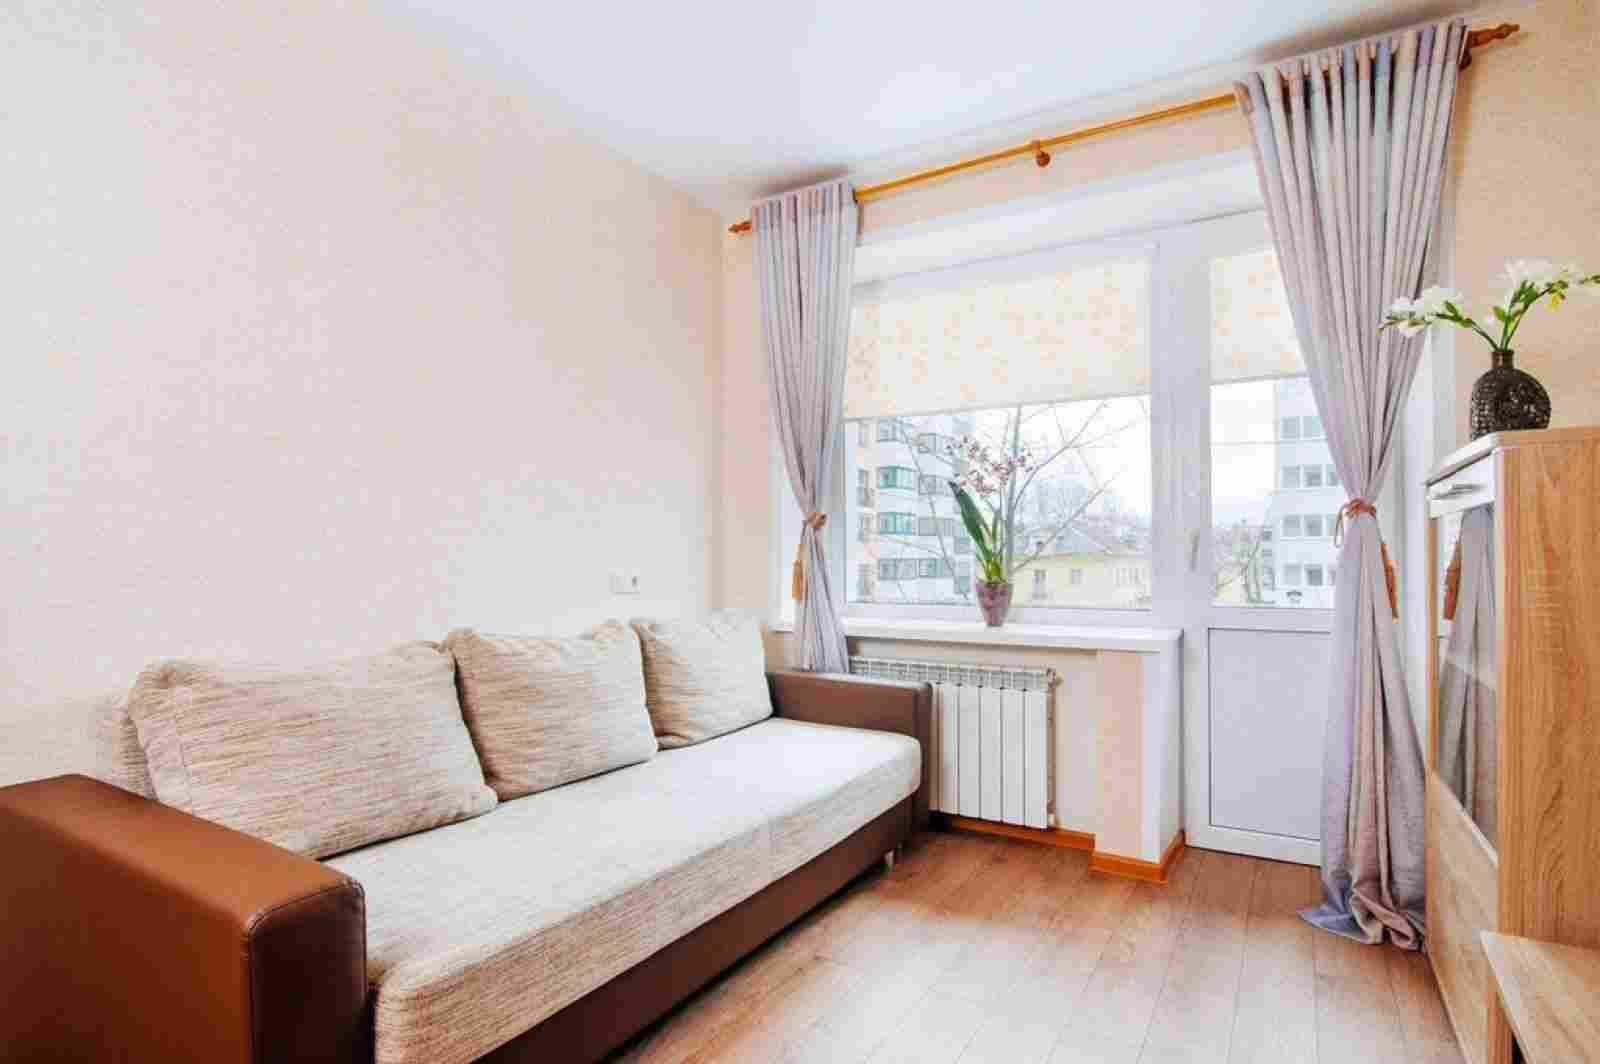 1-комнатная квартира в шаговой доступности от ст. м. Парк Челюскинцев. Фото